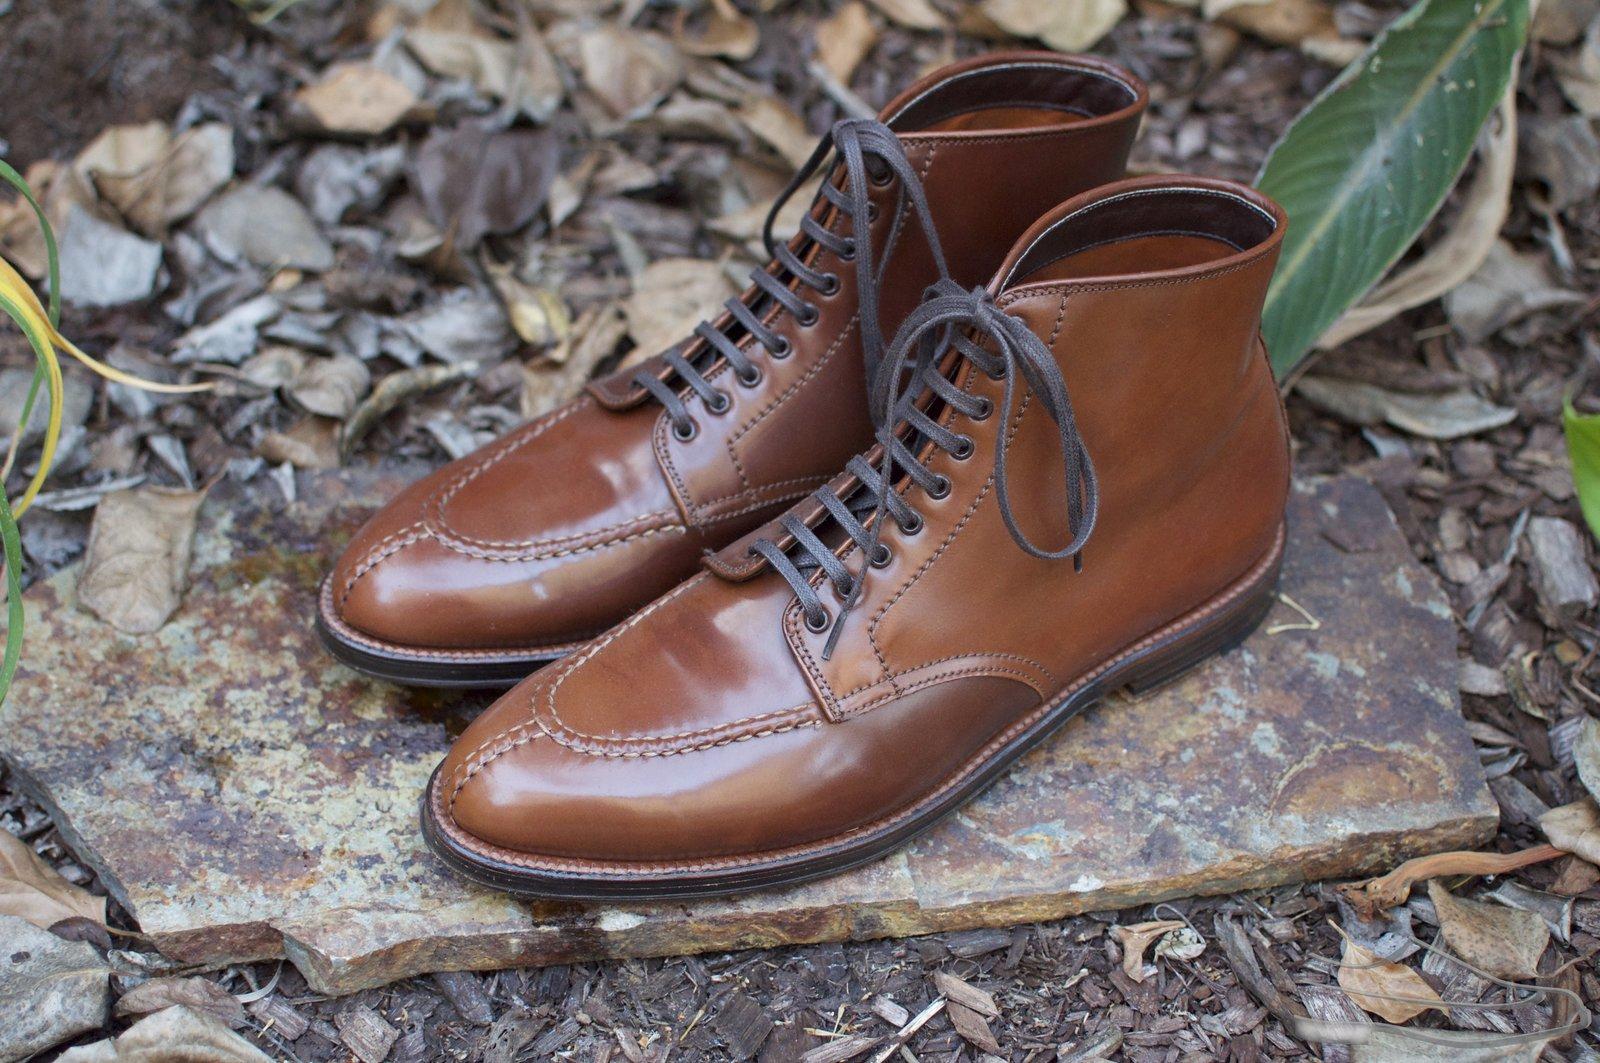 Alden Ravello Shell Cordovan NST Boots - 2020-09-17 - 1.jpg